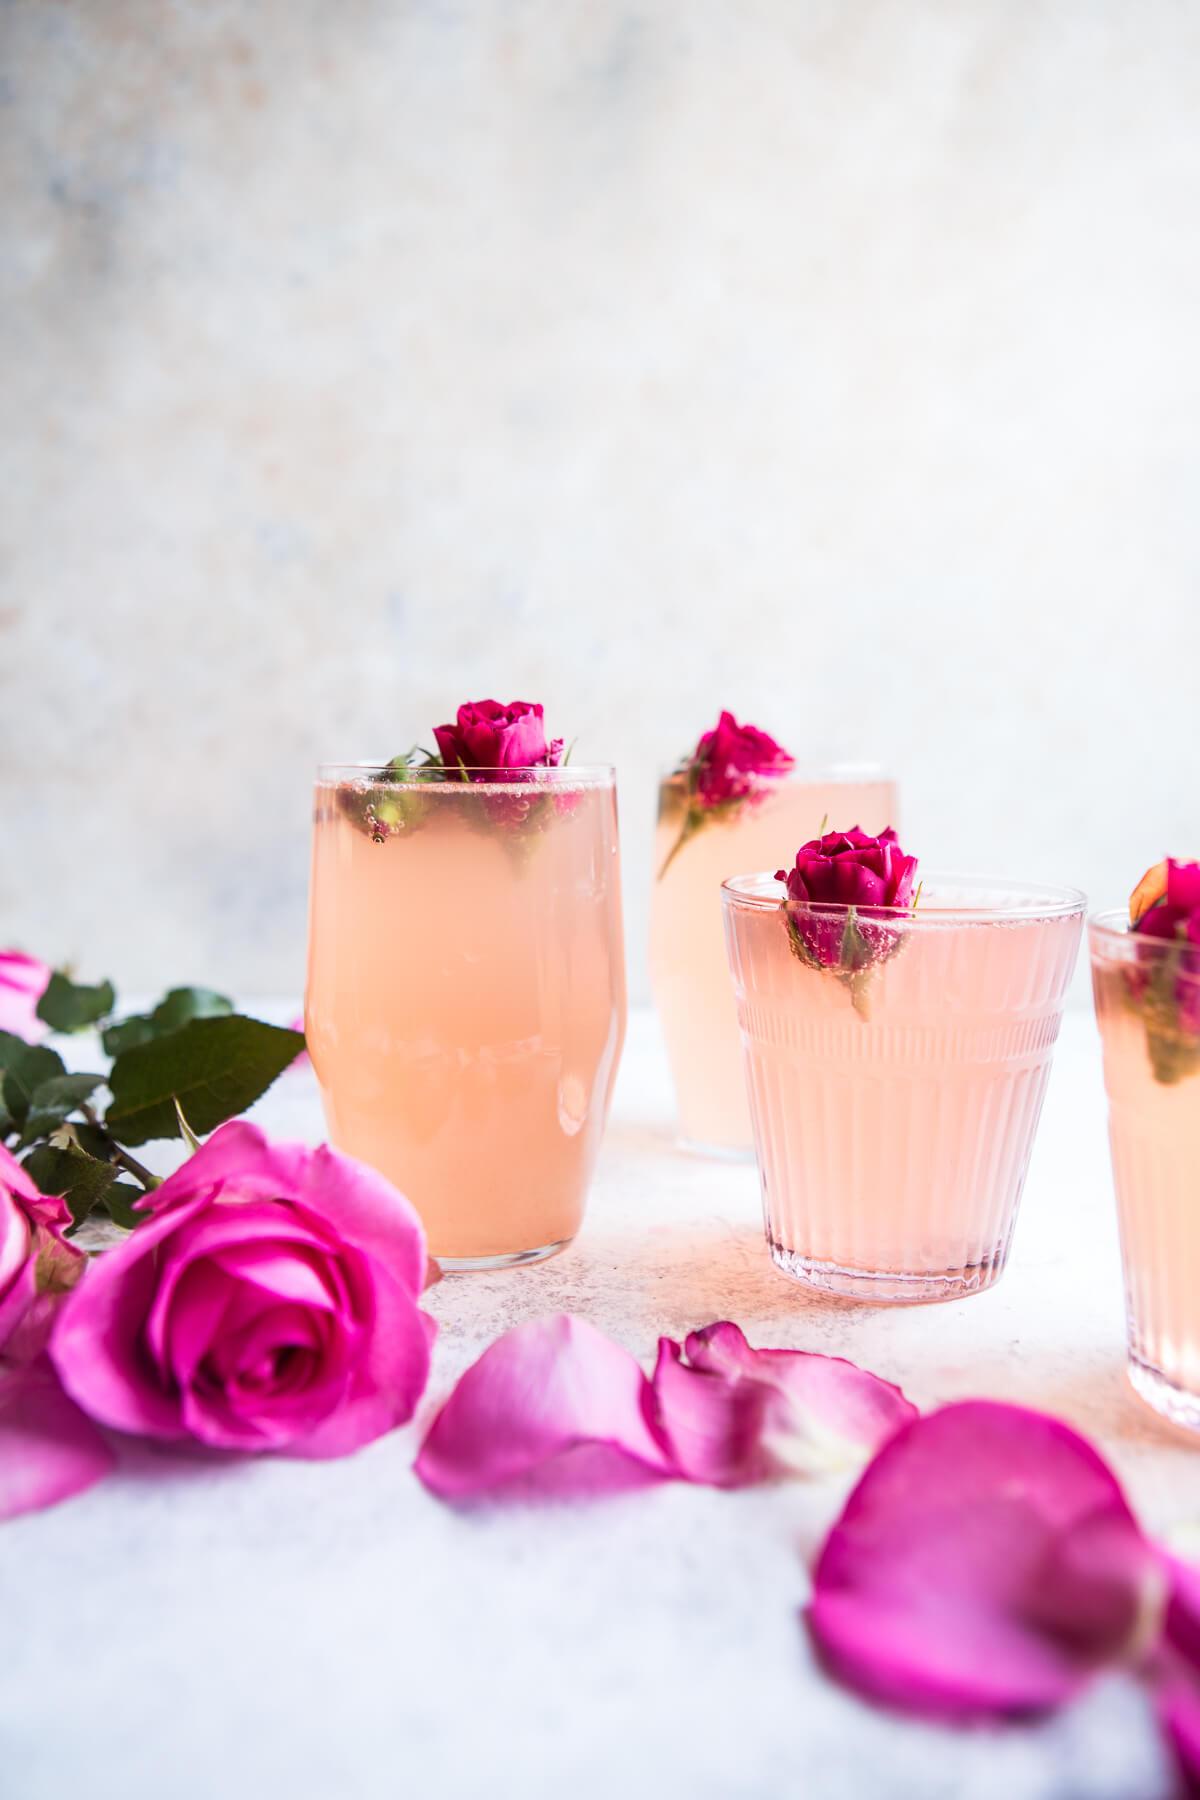 Rose-Lemon-Spriter-galentines-valentines-recipe